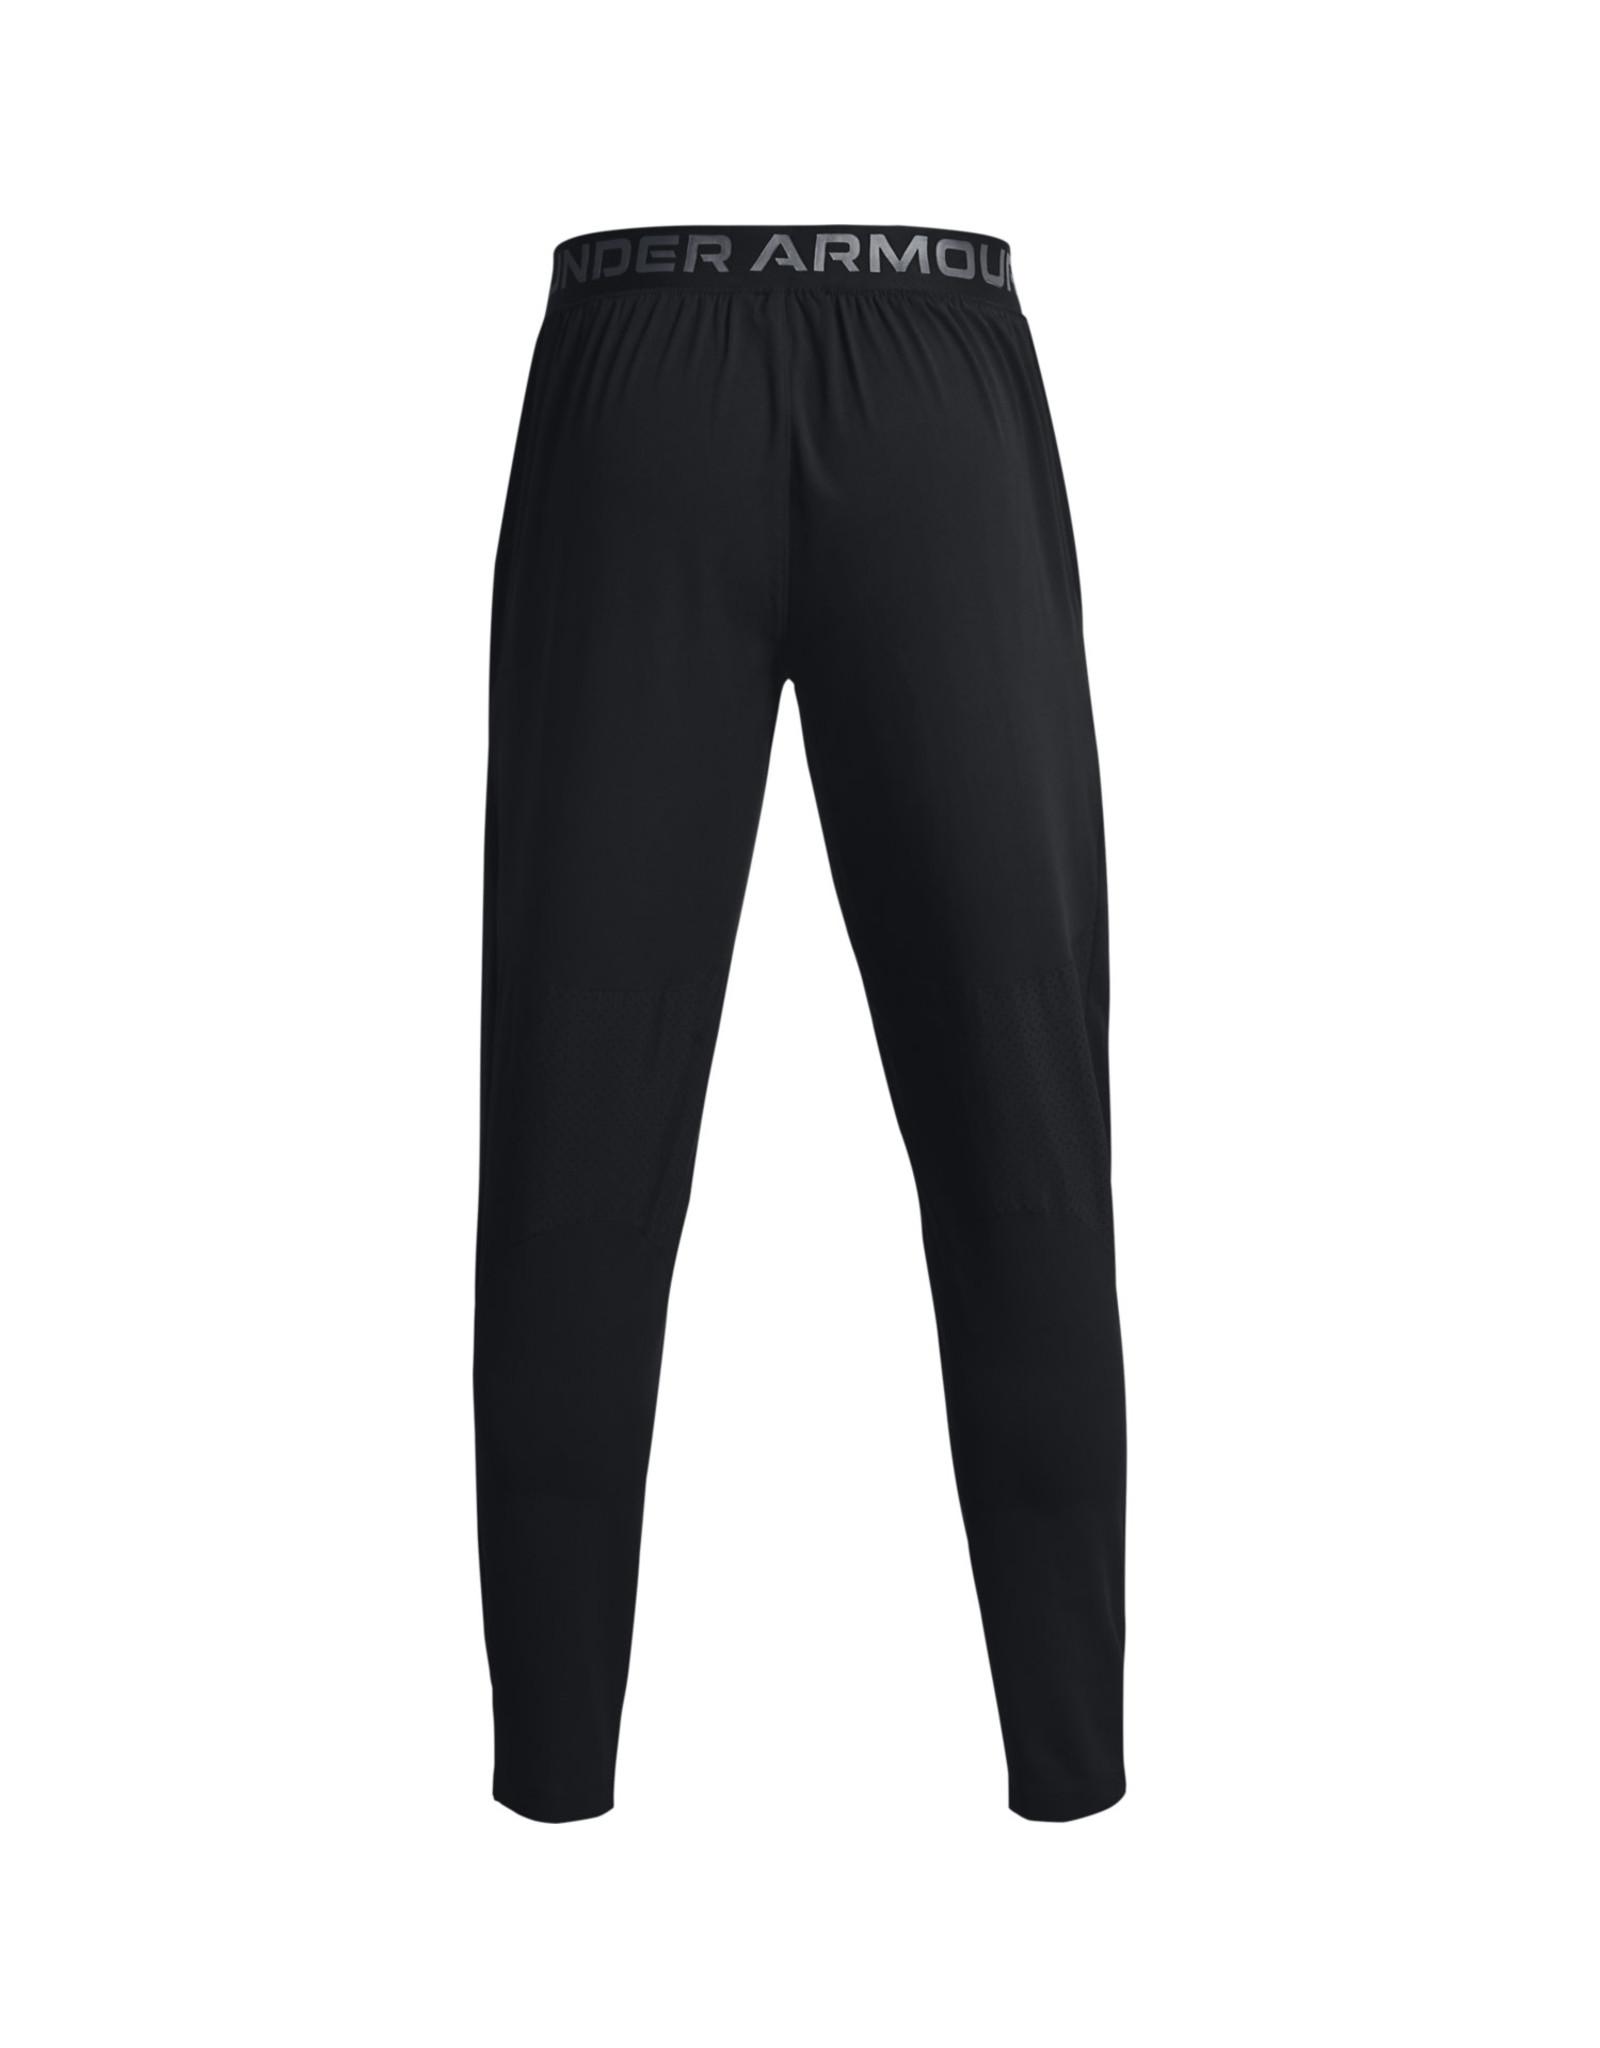 Under Armour UA WOVEN PANT-Black